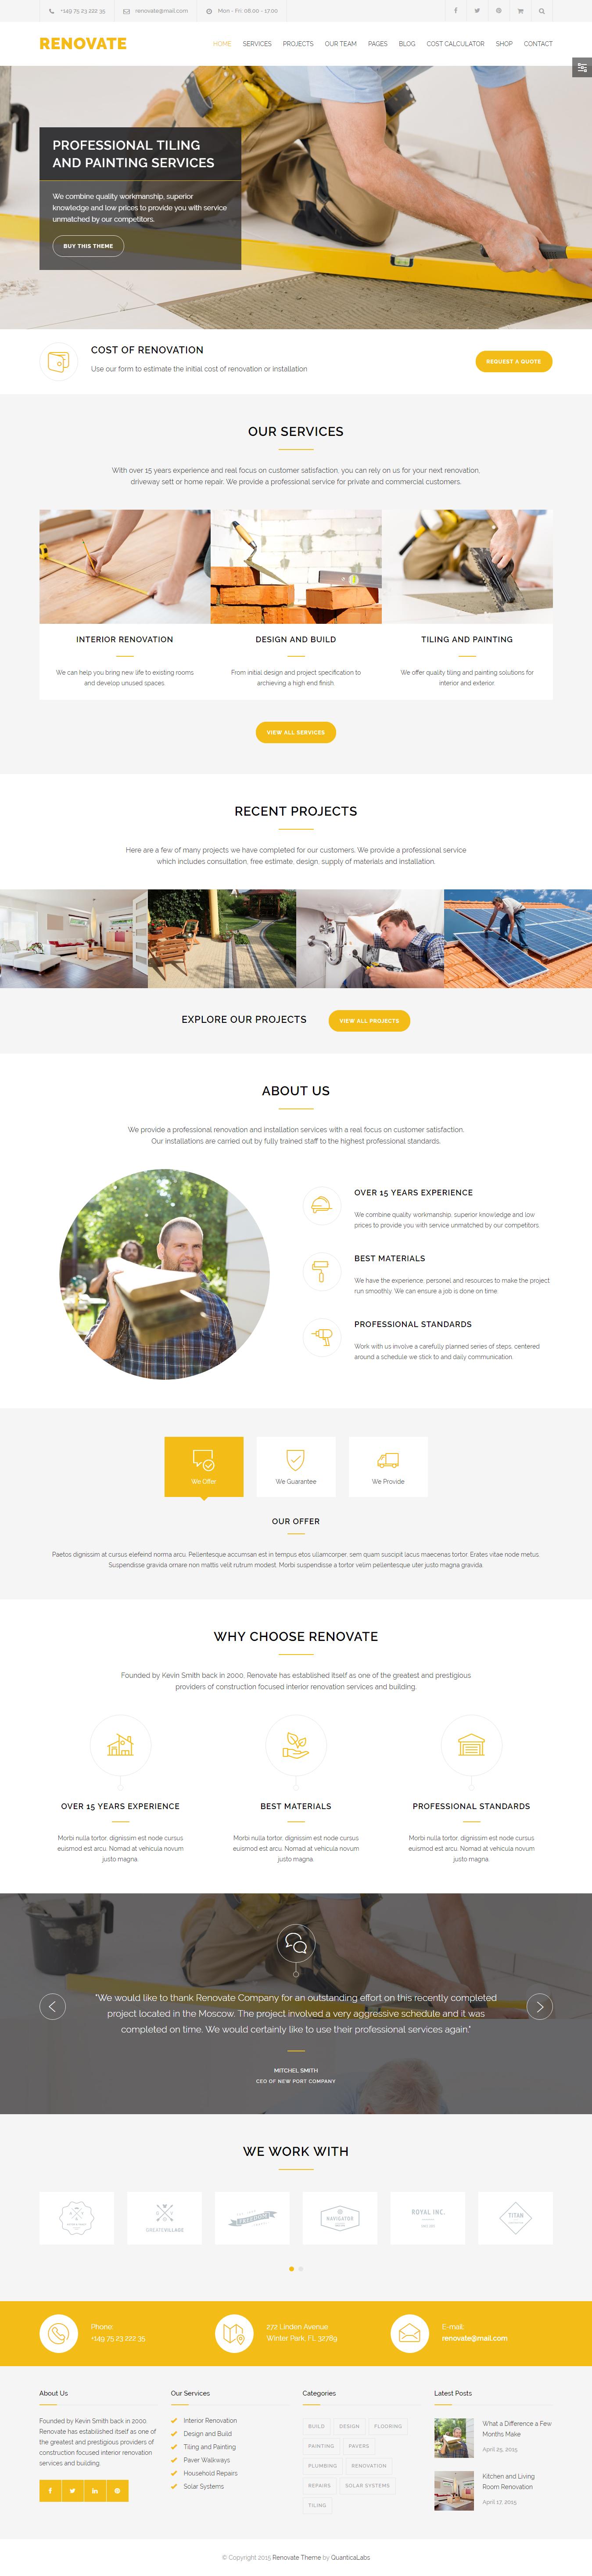 Renovate - Best Premium Construction Business Company WordPress Theme